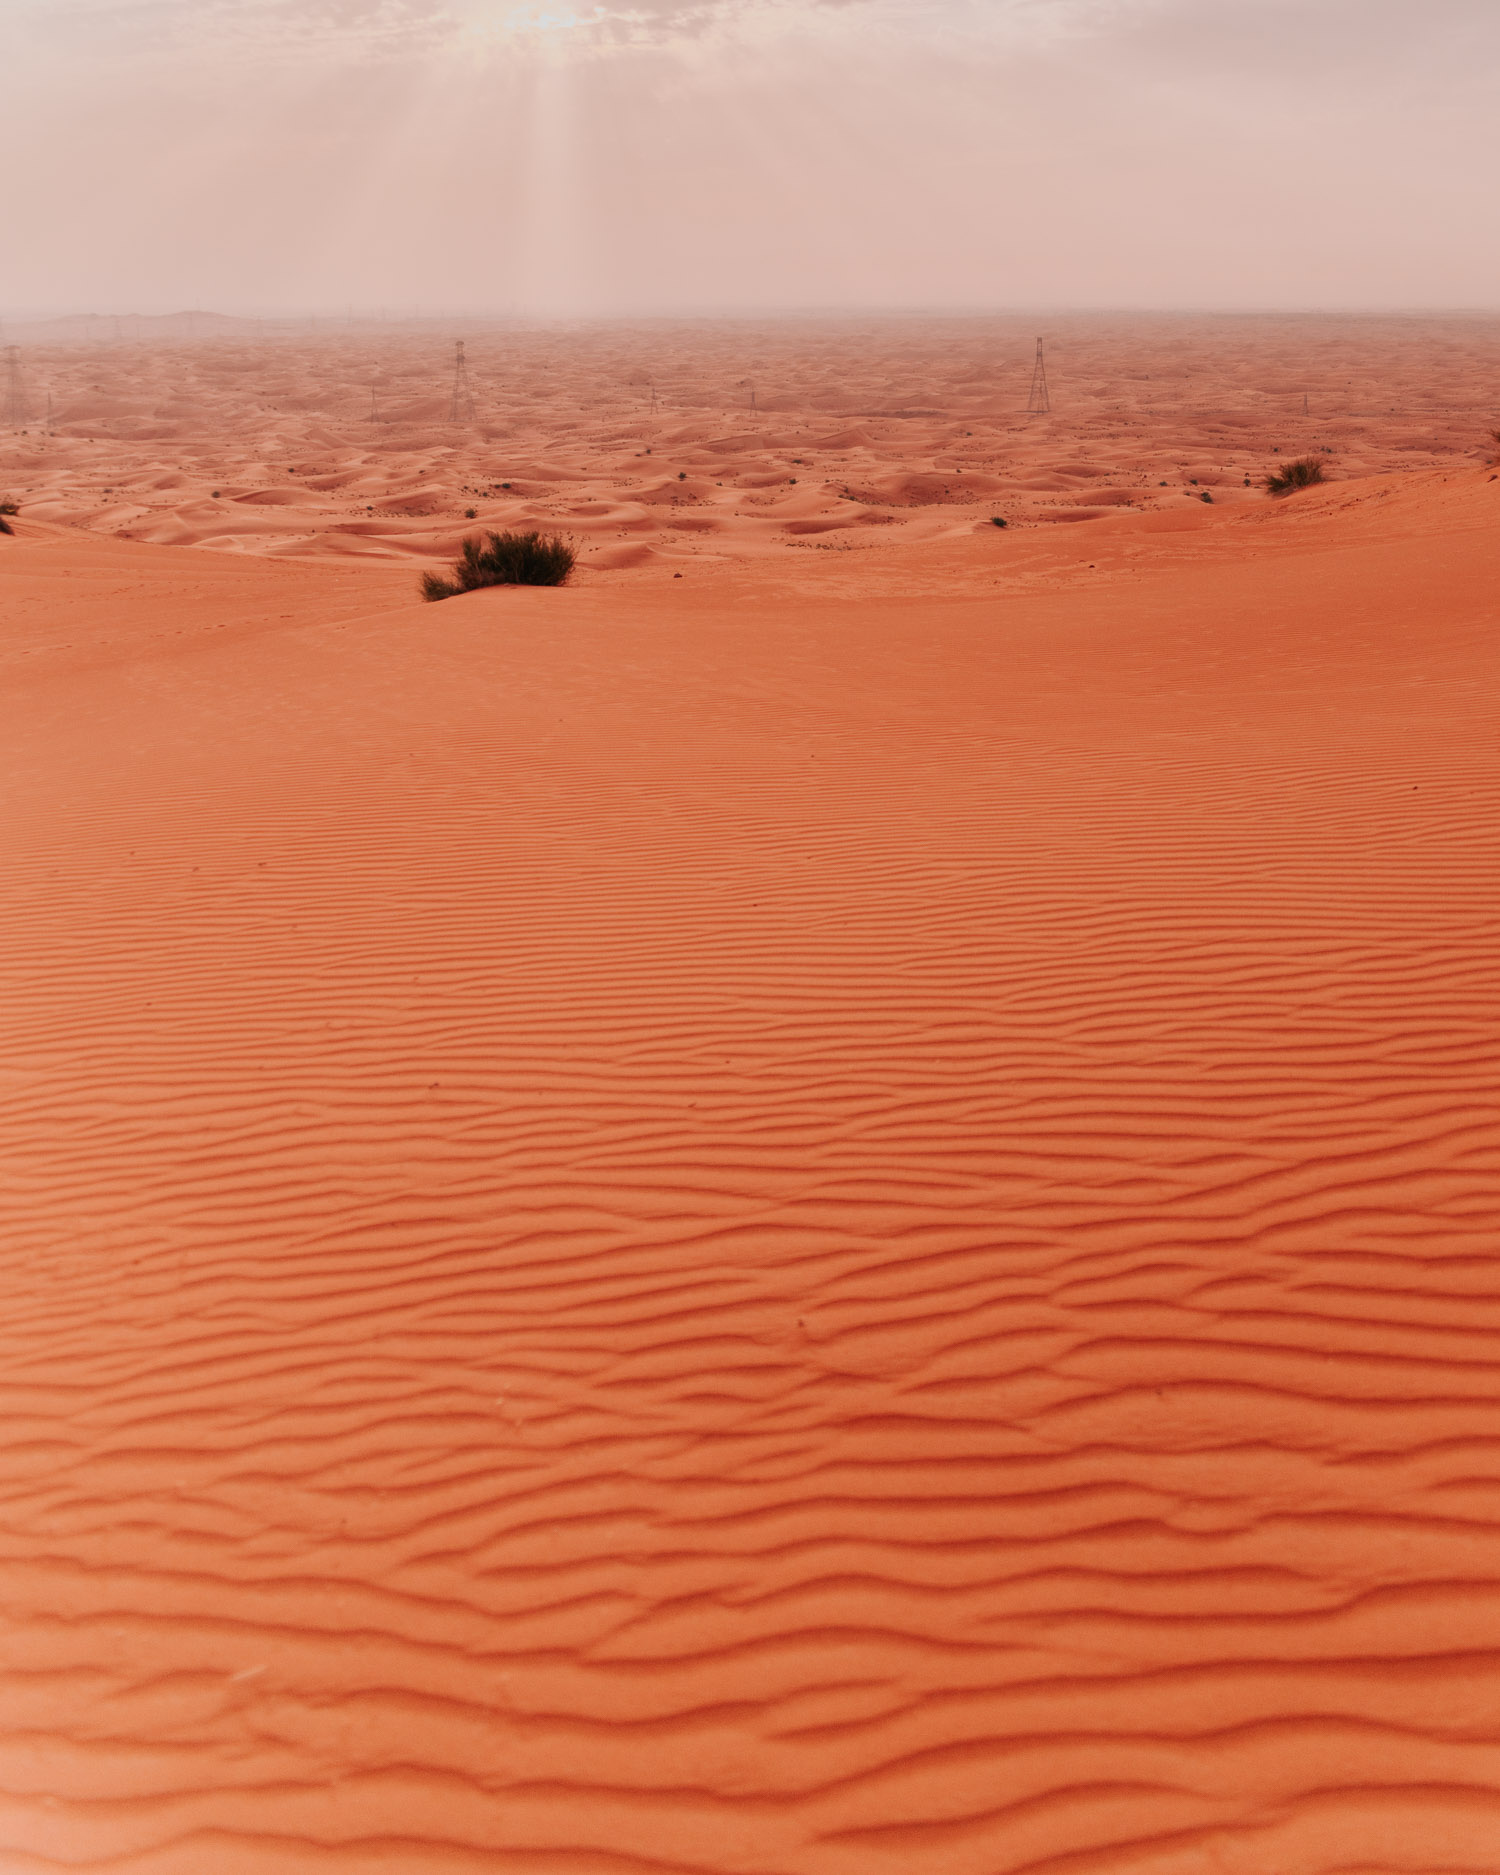 Vackra sanddynor så långt ögat kan nå i Mleiha